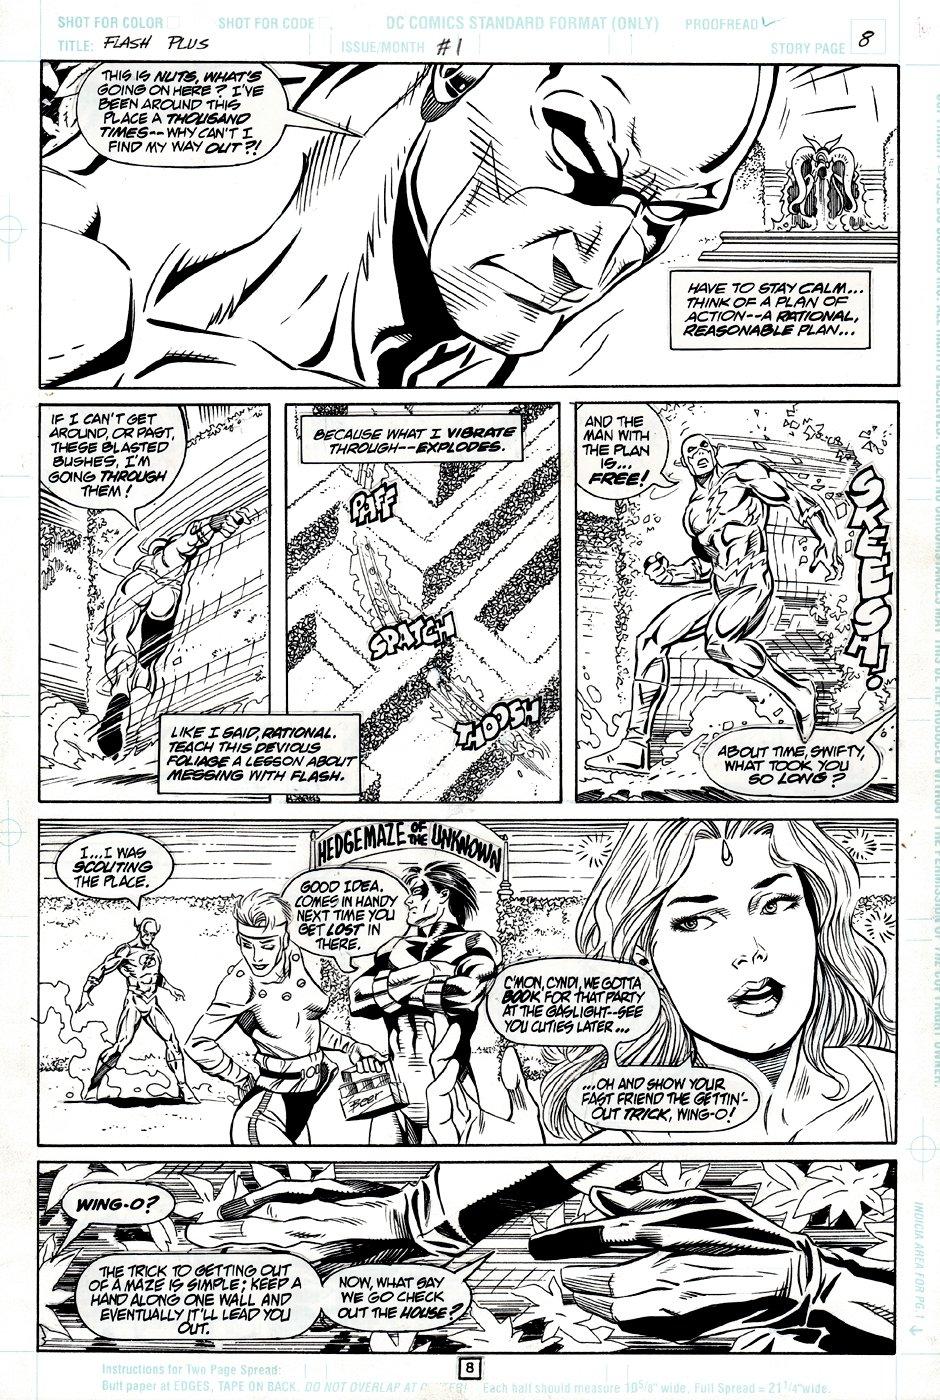 Flash Plus #1 p 8 (FLASH THROUGHOUT RUNNING THROUGH A MAZE!) 1996